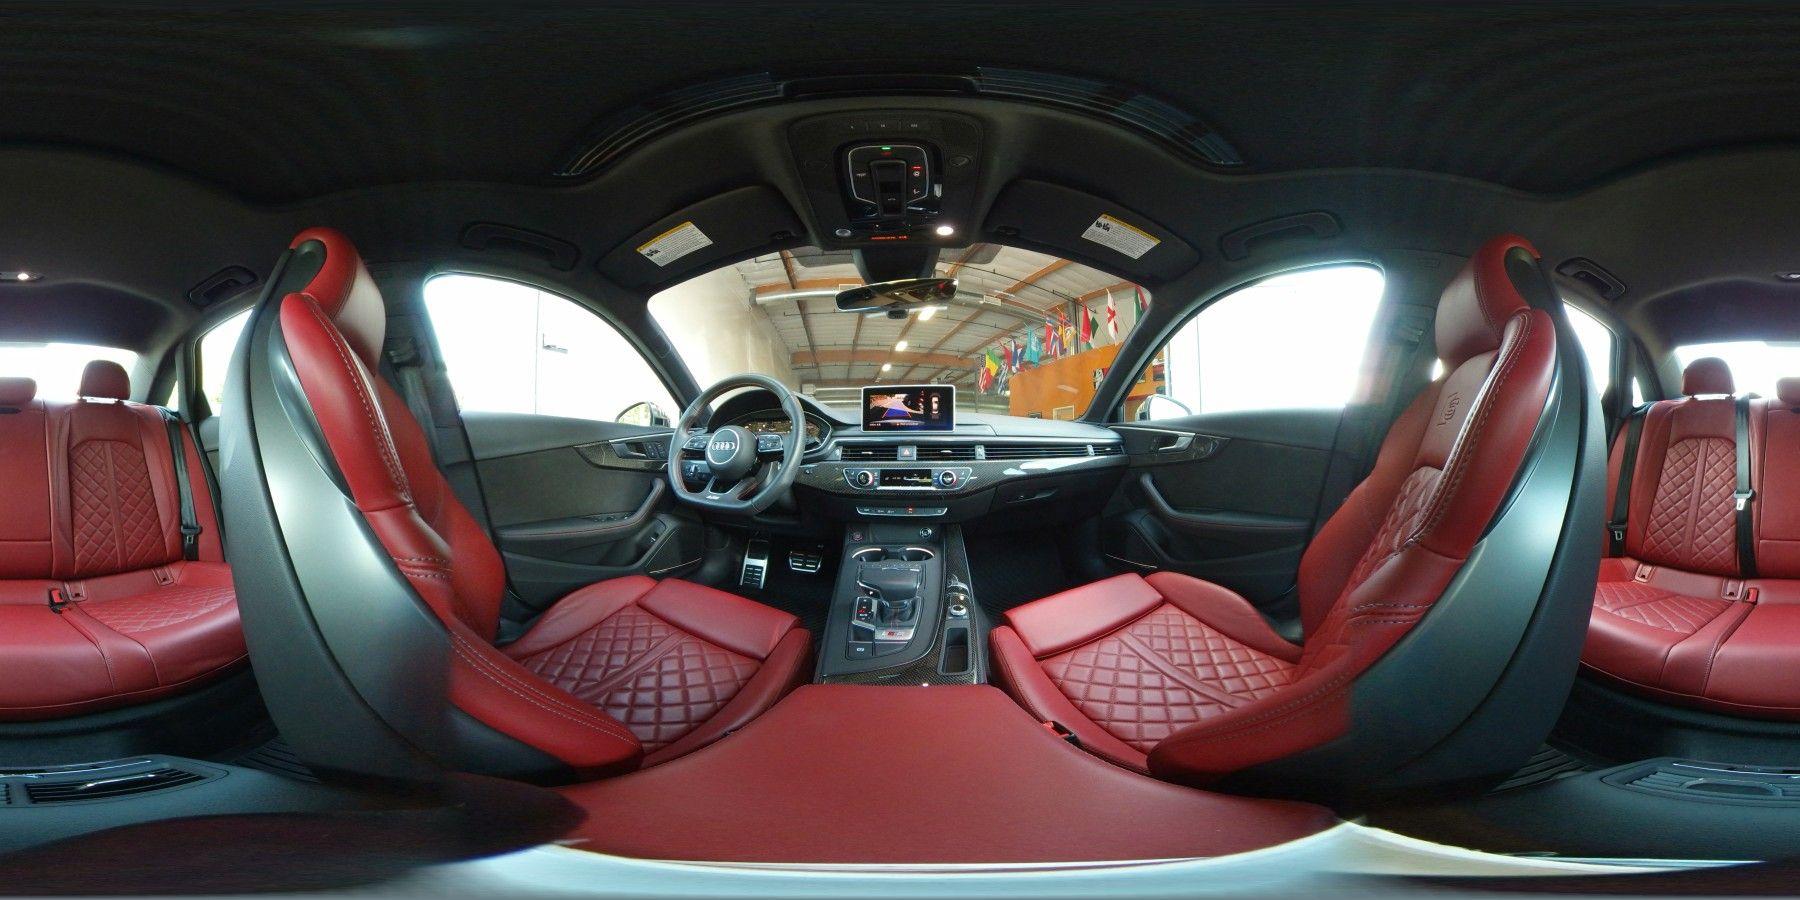 2018 audi s4 red interior audi s4 audi matte cars